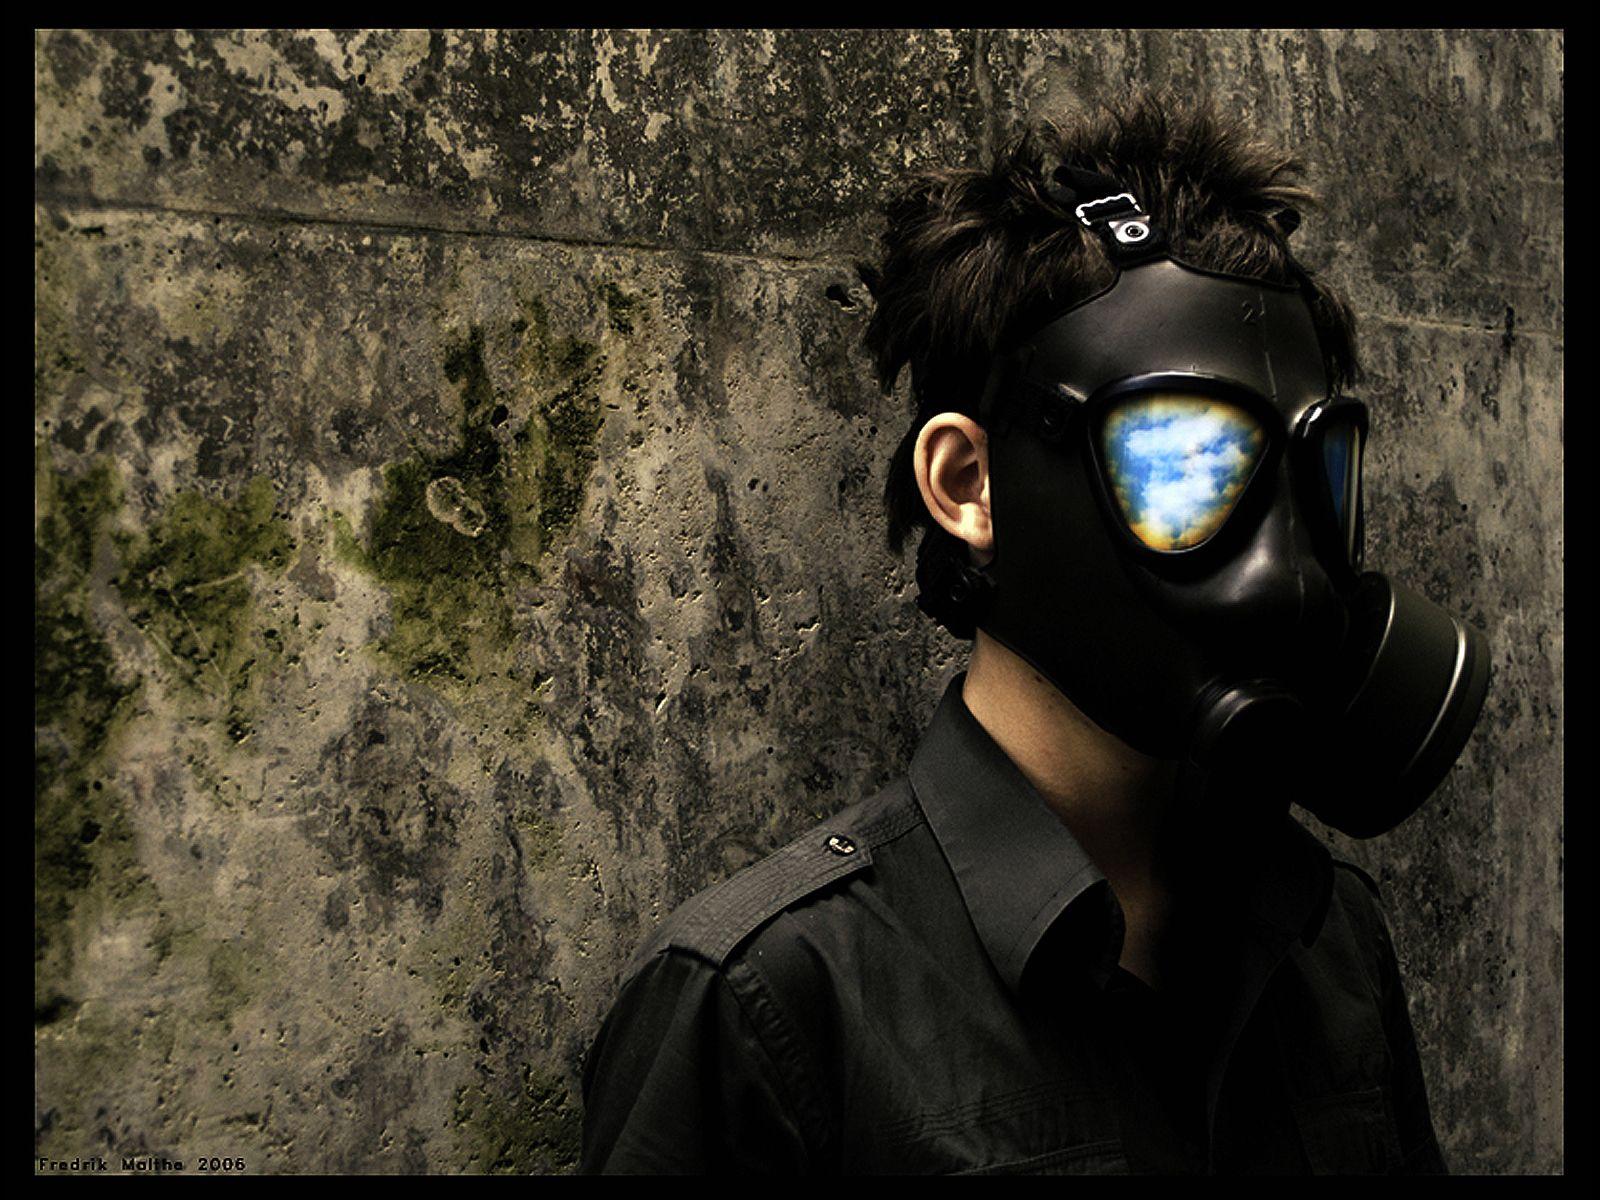 Top Gas Mask Skull Wallpaper Wallpapers | Gas masks | Pinterest ...